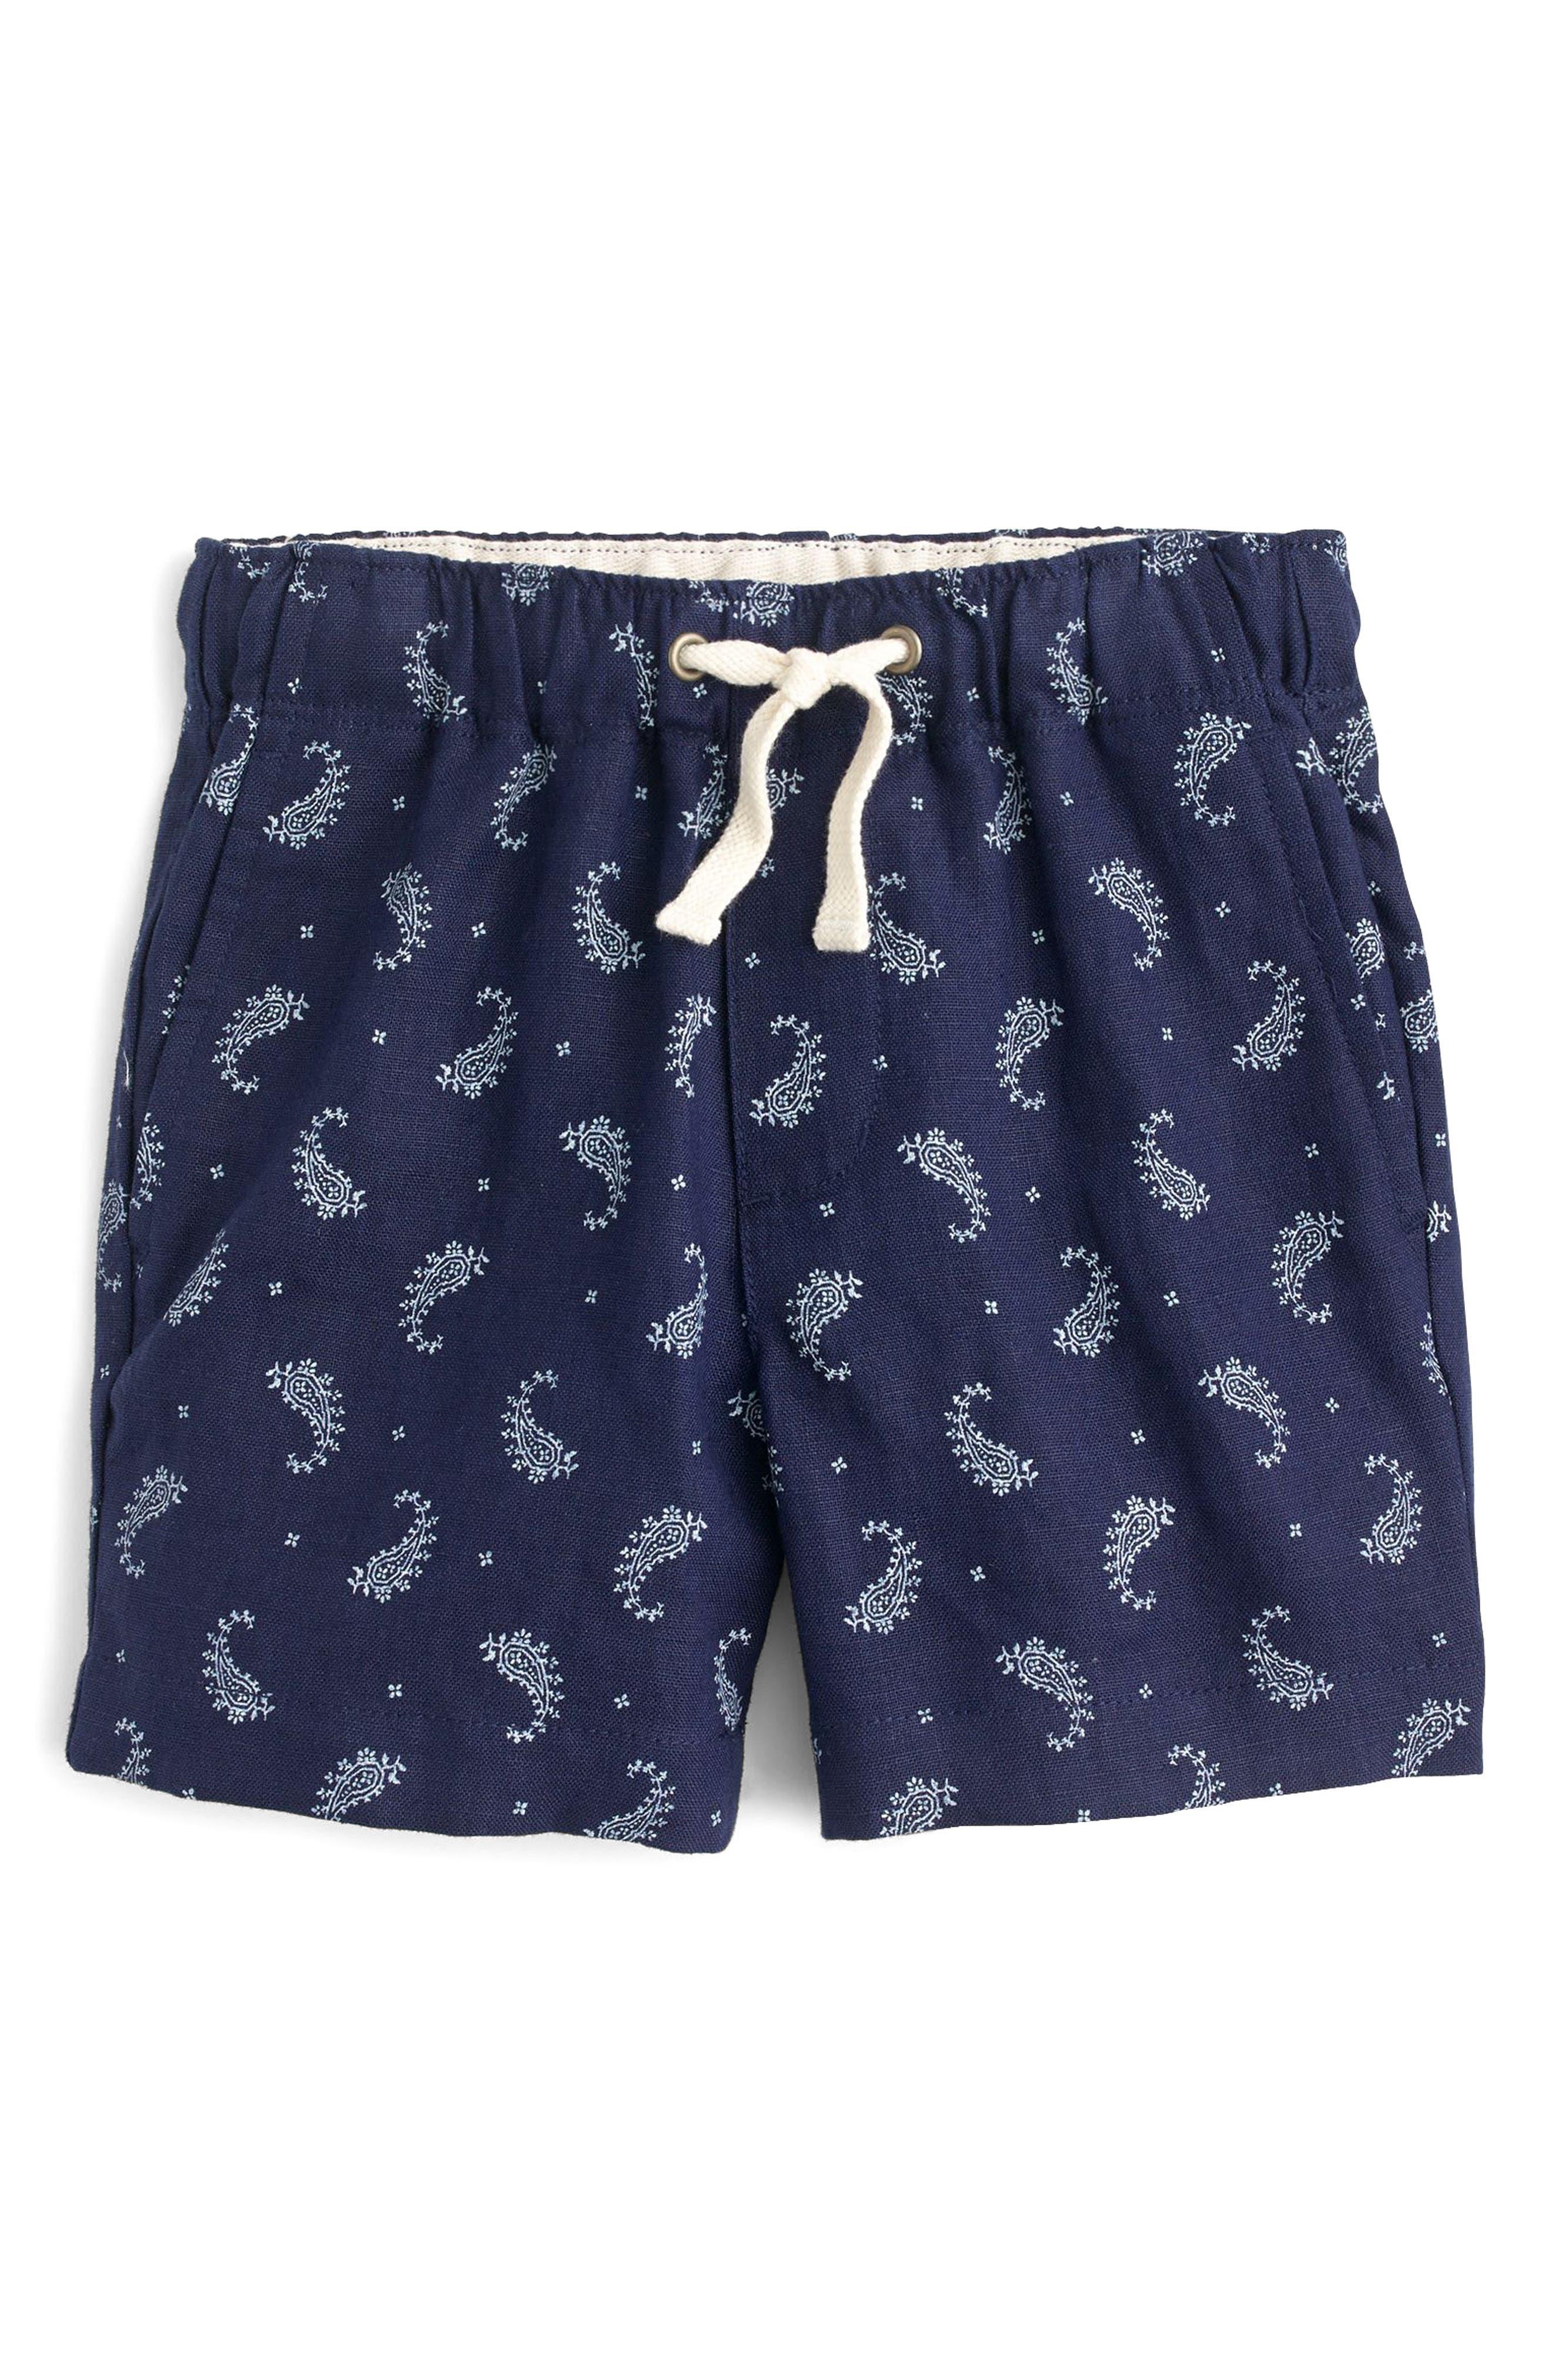 Paisley Dock Shorts,                         Main,                         color, Indigo Bandana